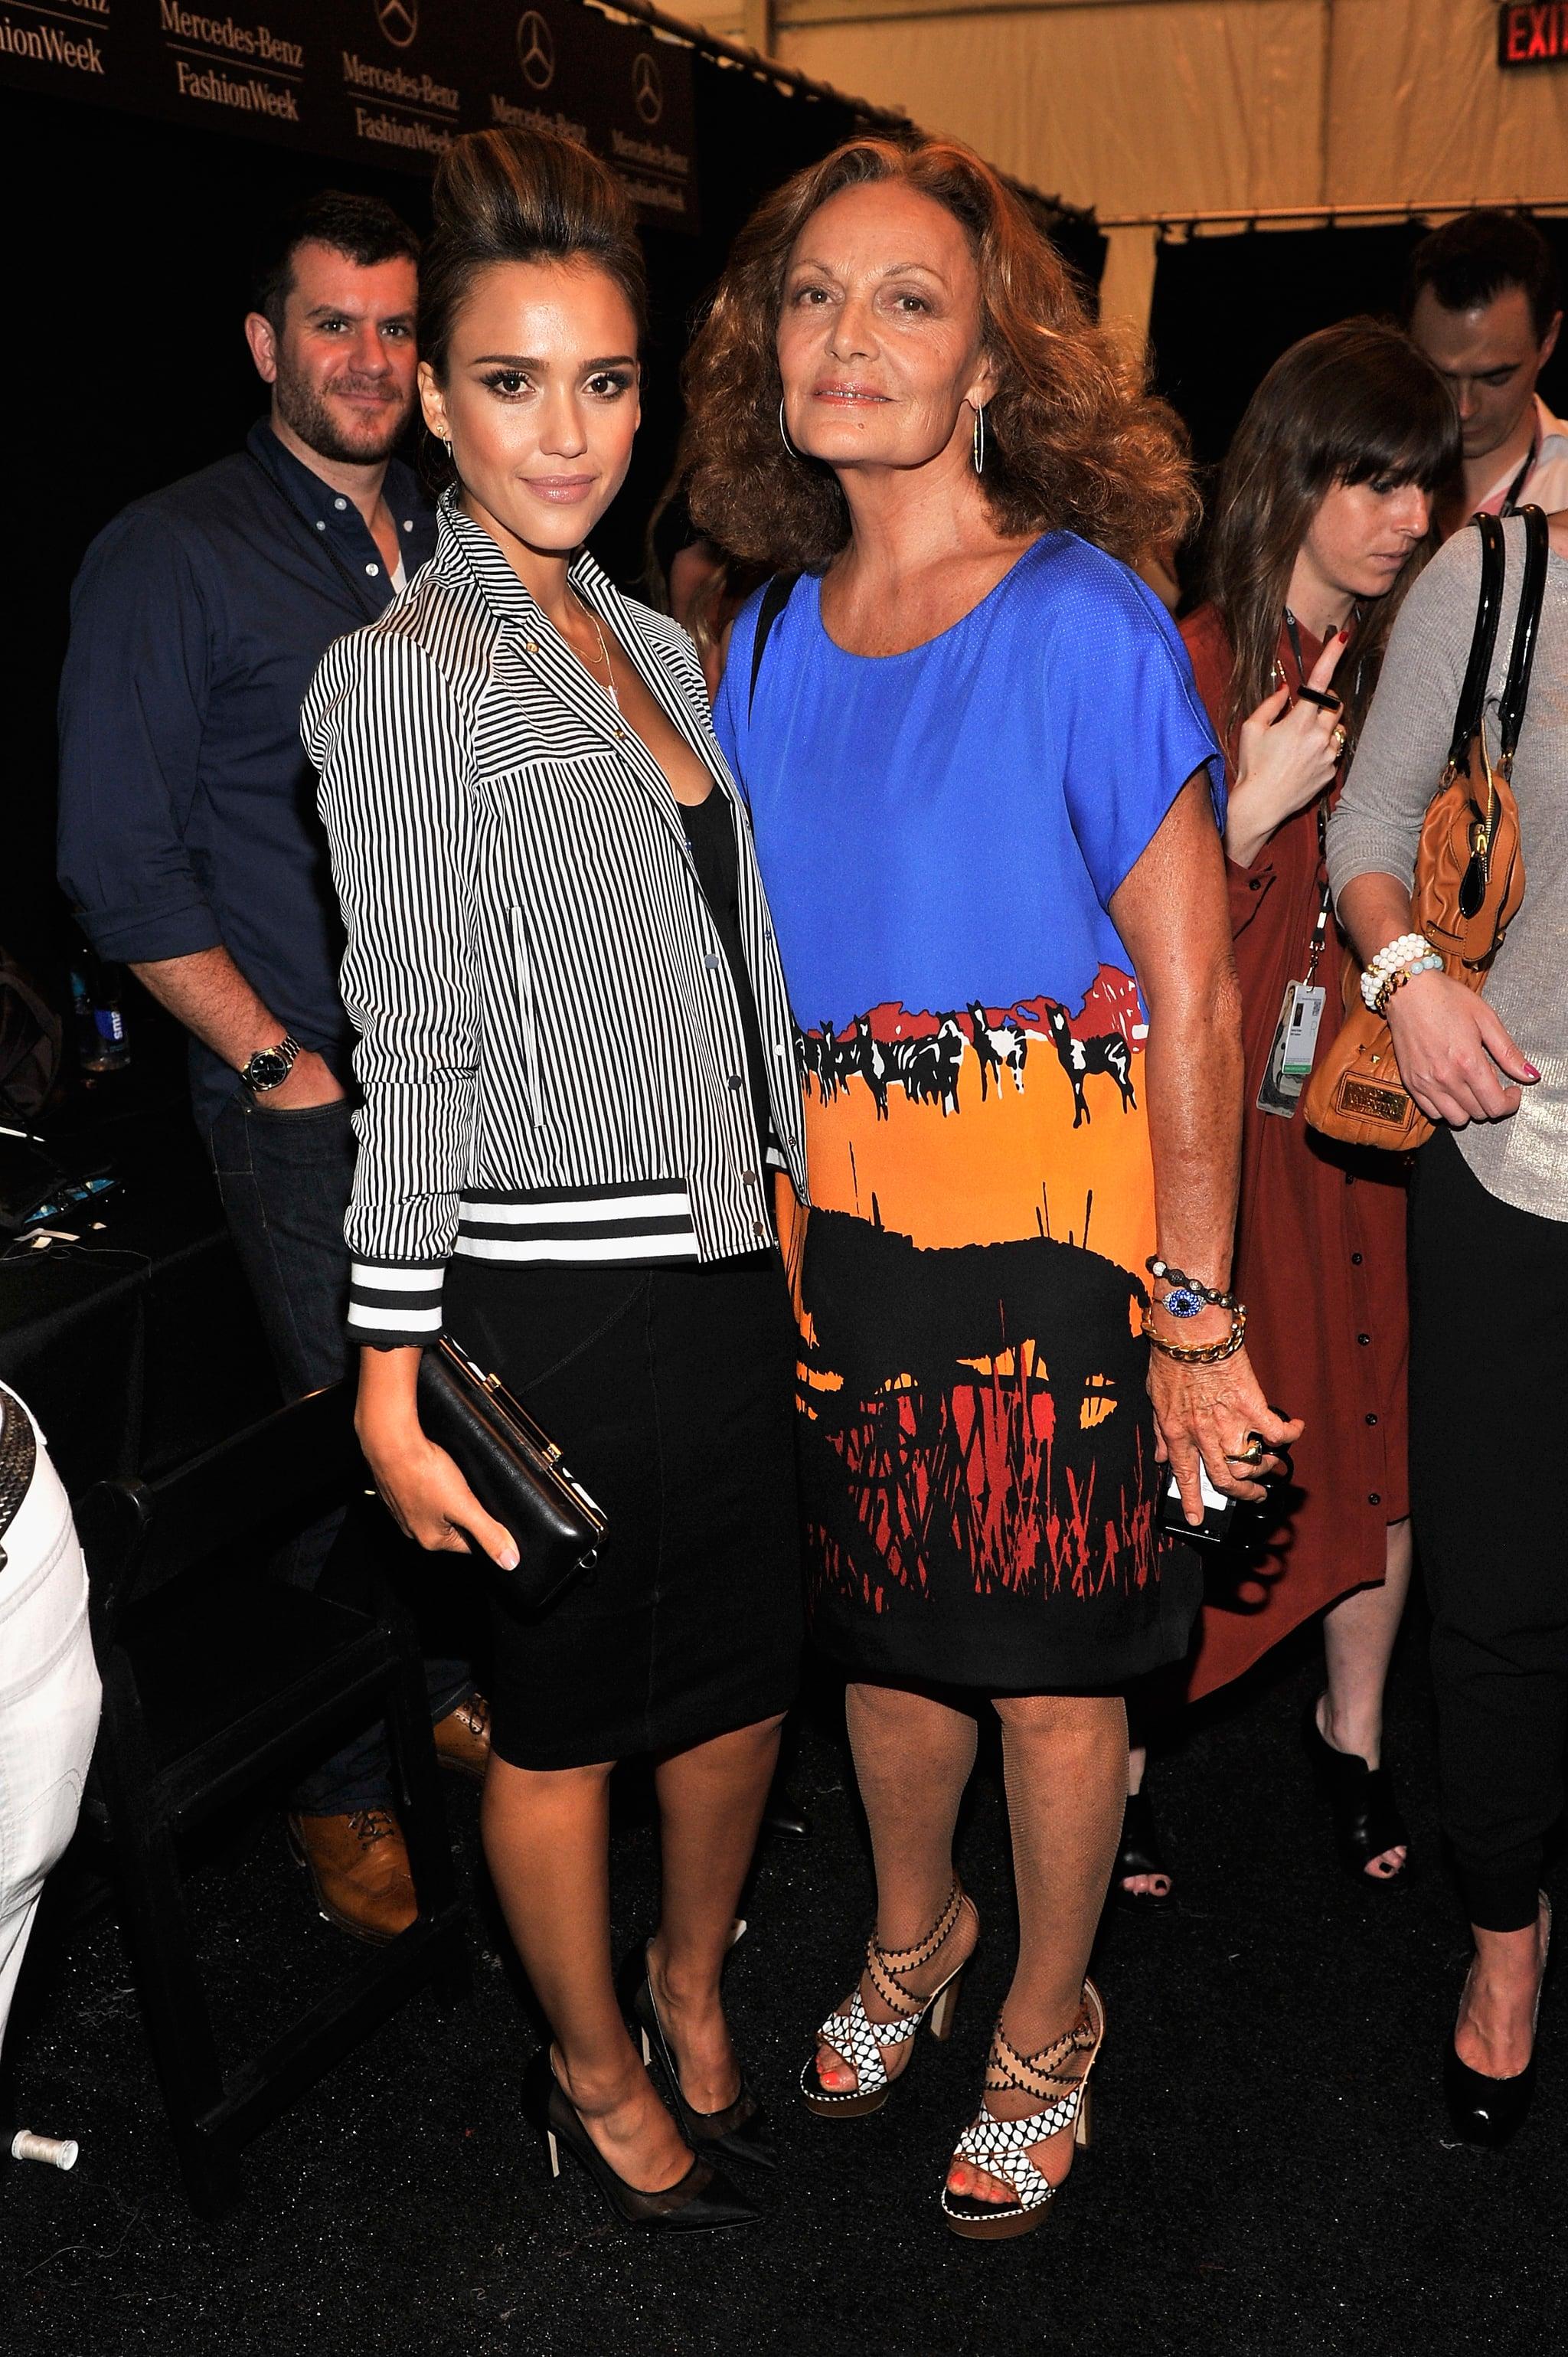 Jessica Alba posed backstage with Diane von Furstenberg before the designer's runway show on Sunday.